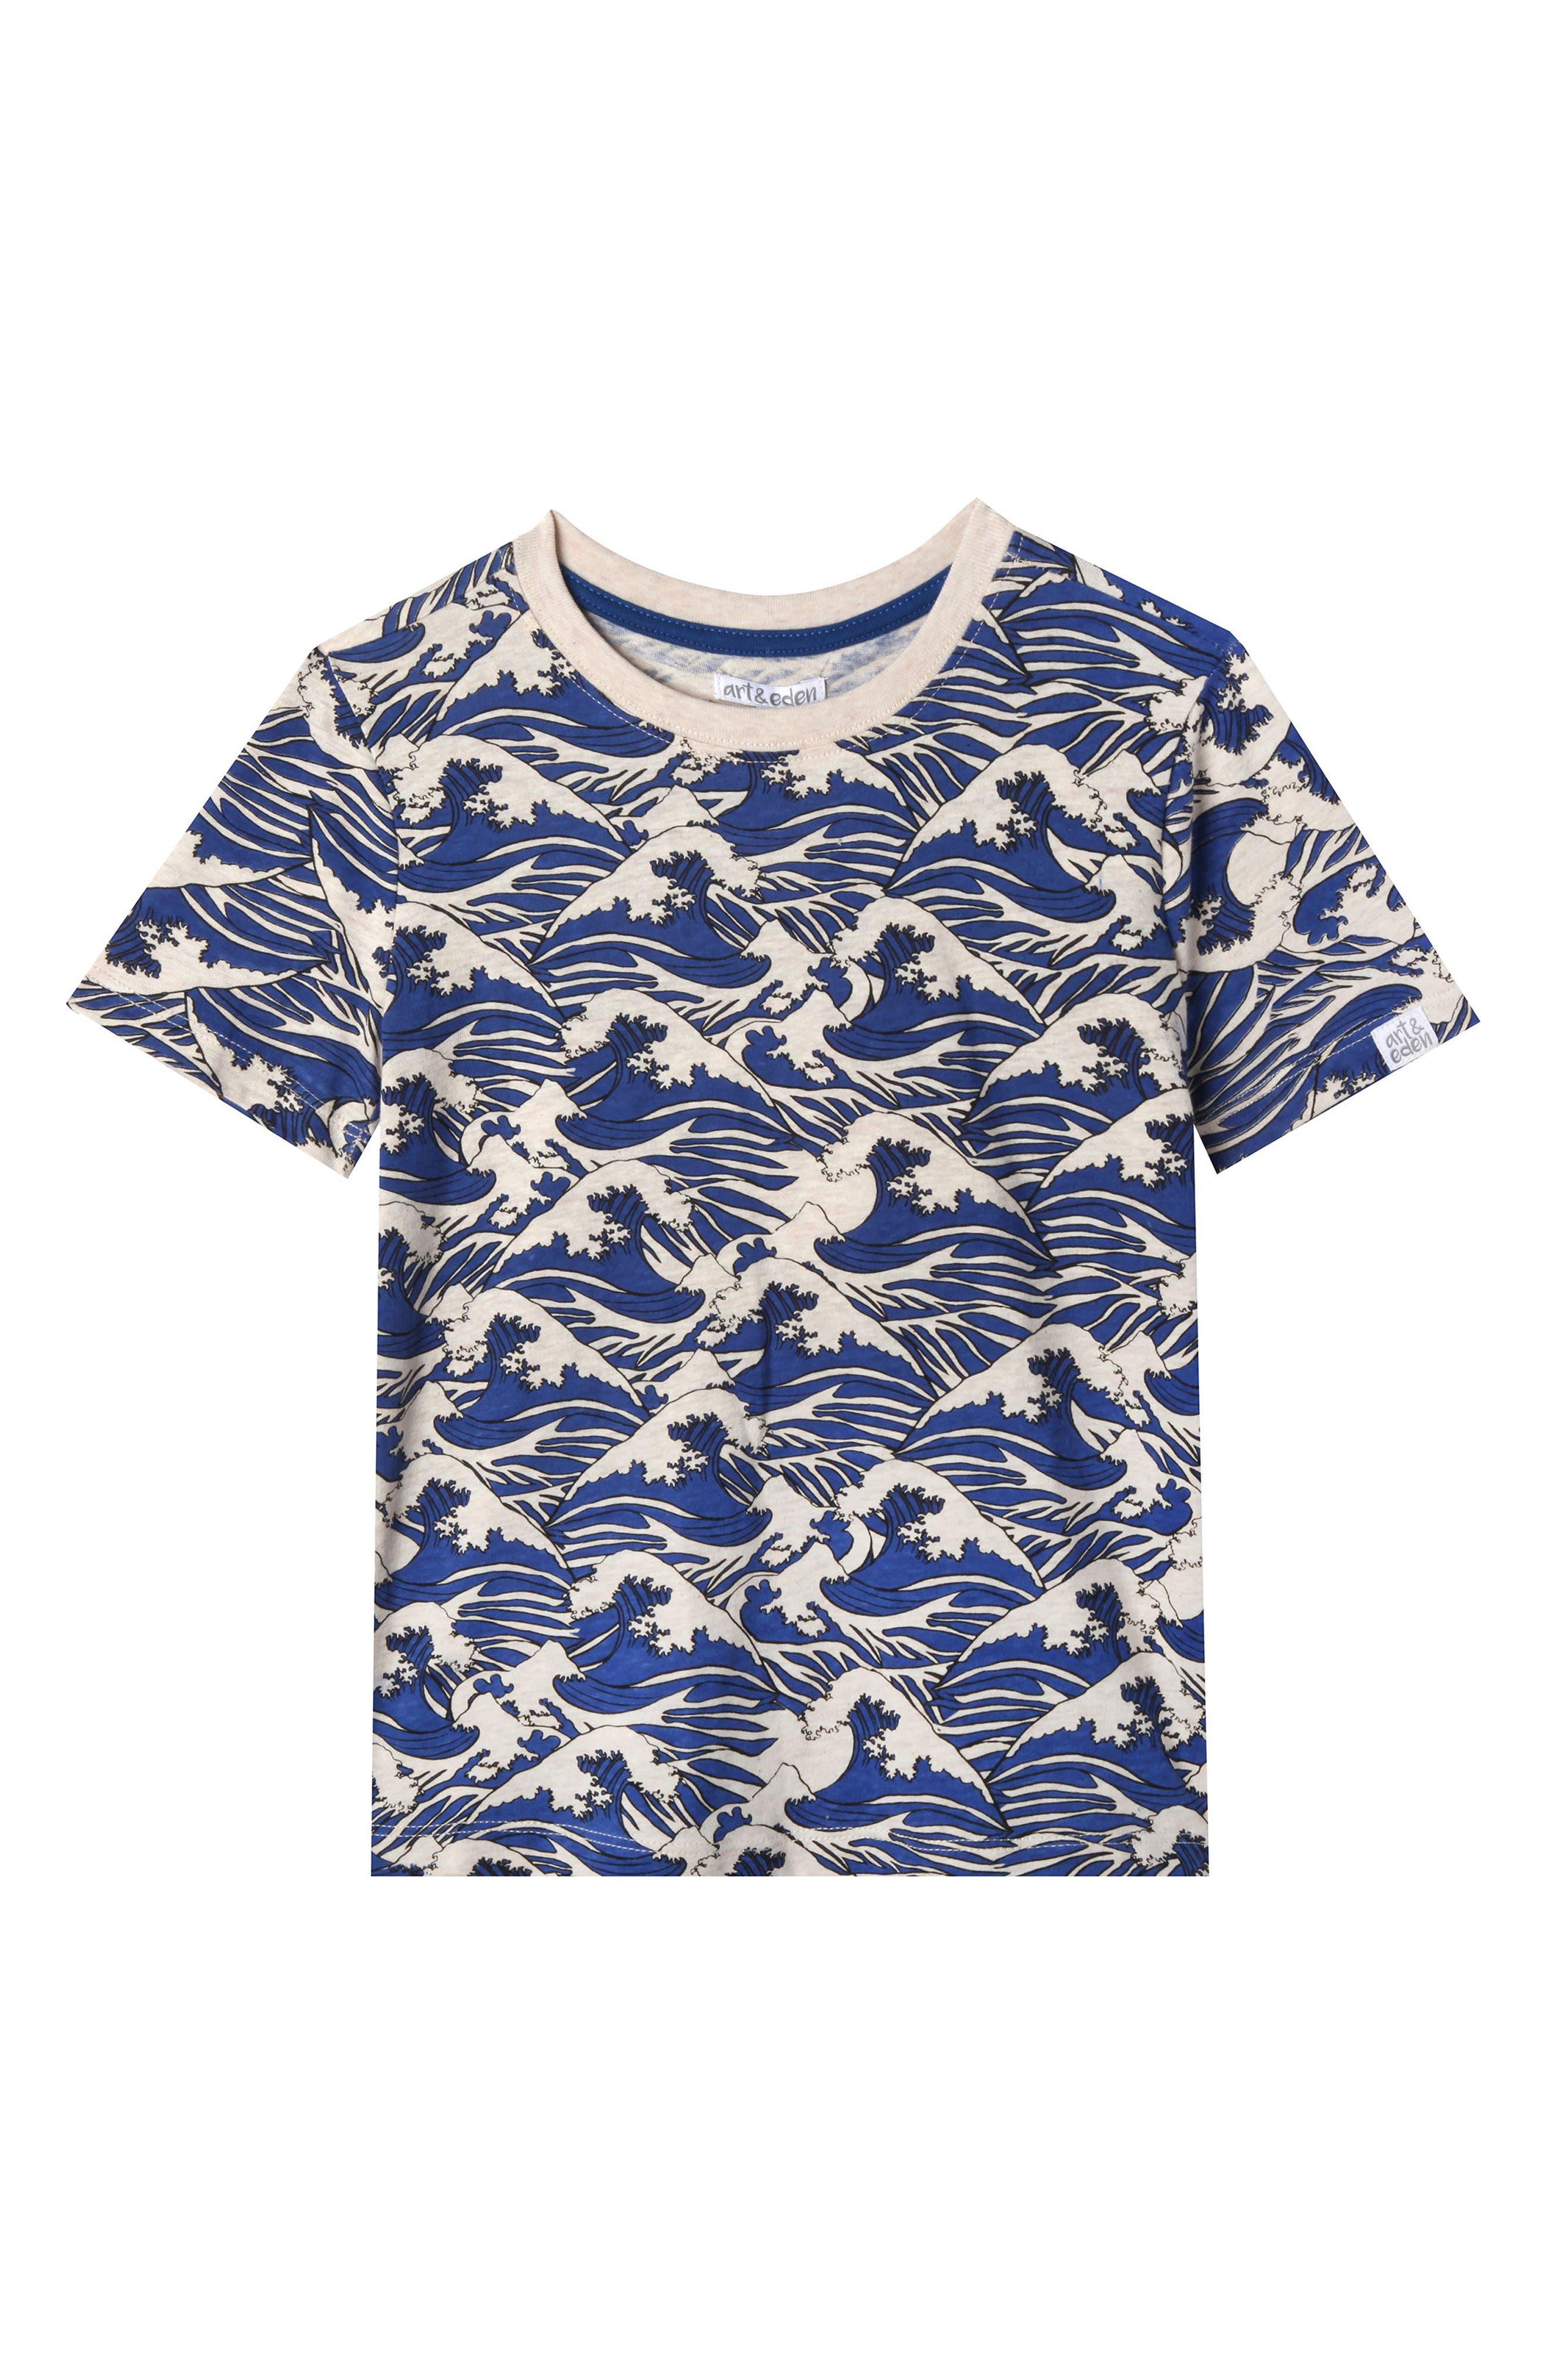 David Ocean Waves Organic Cotton T-Shirt,                             Main thumbnail 1, color,                             Oatmeal